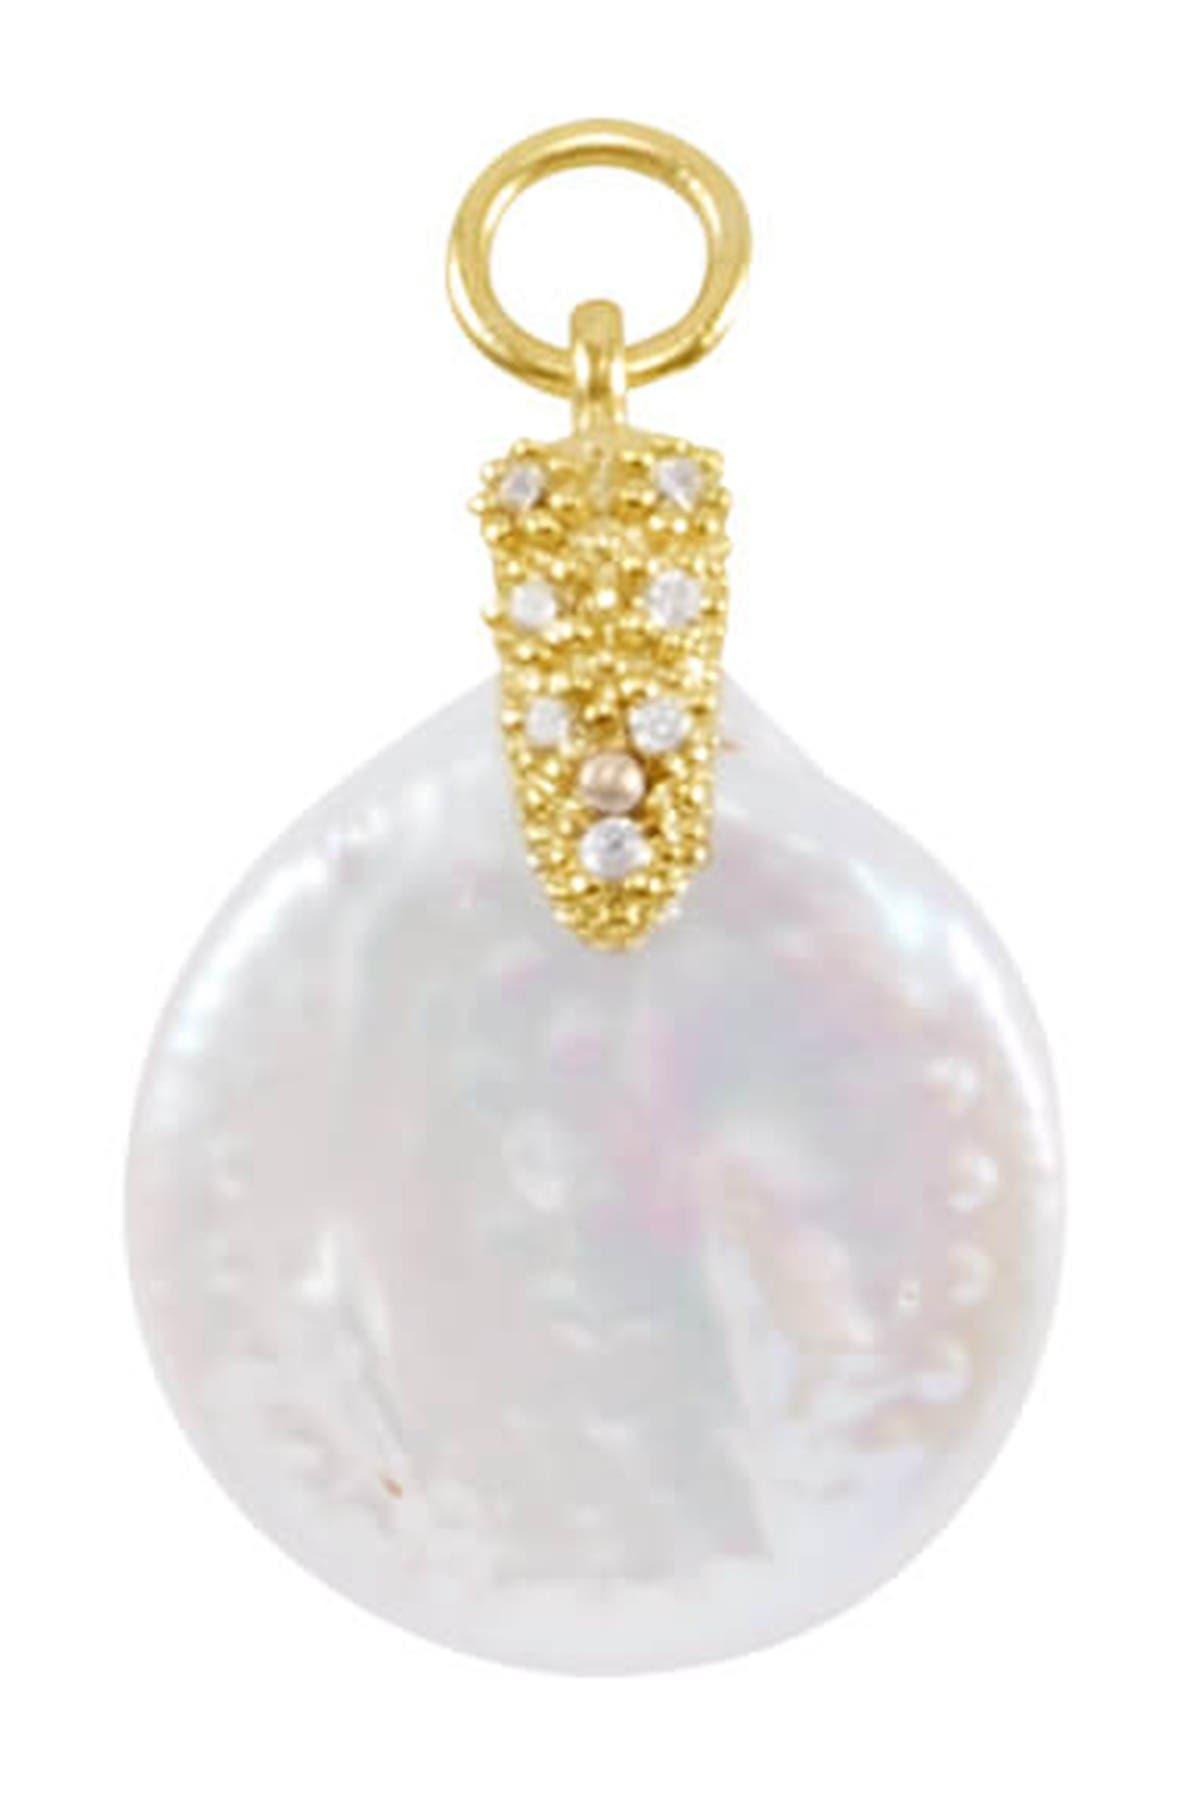 Image of Kendra Scott Cultured 7mm Pearl Open Cuff Charm Bracelet